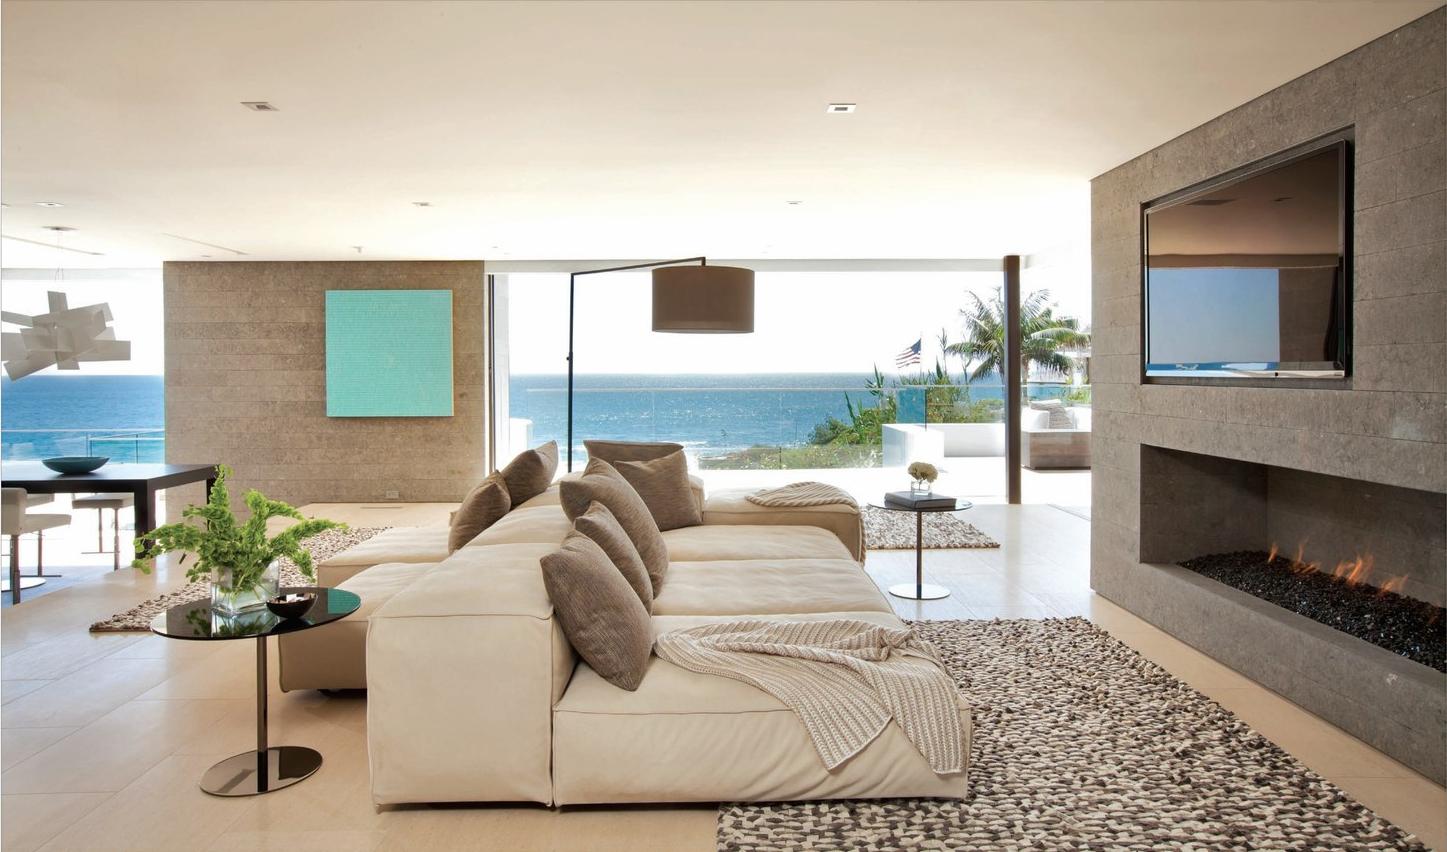 Beach Theme Minimalist Living Room Decorations (Image 2 of 10)